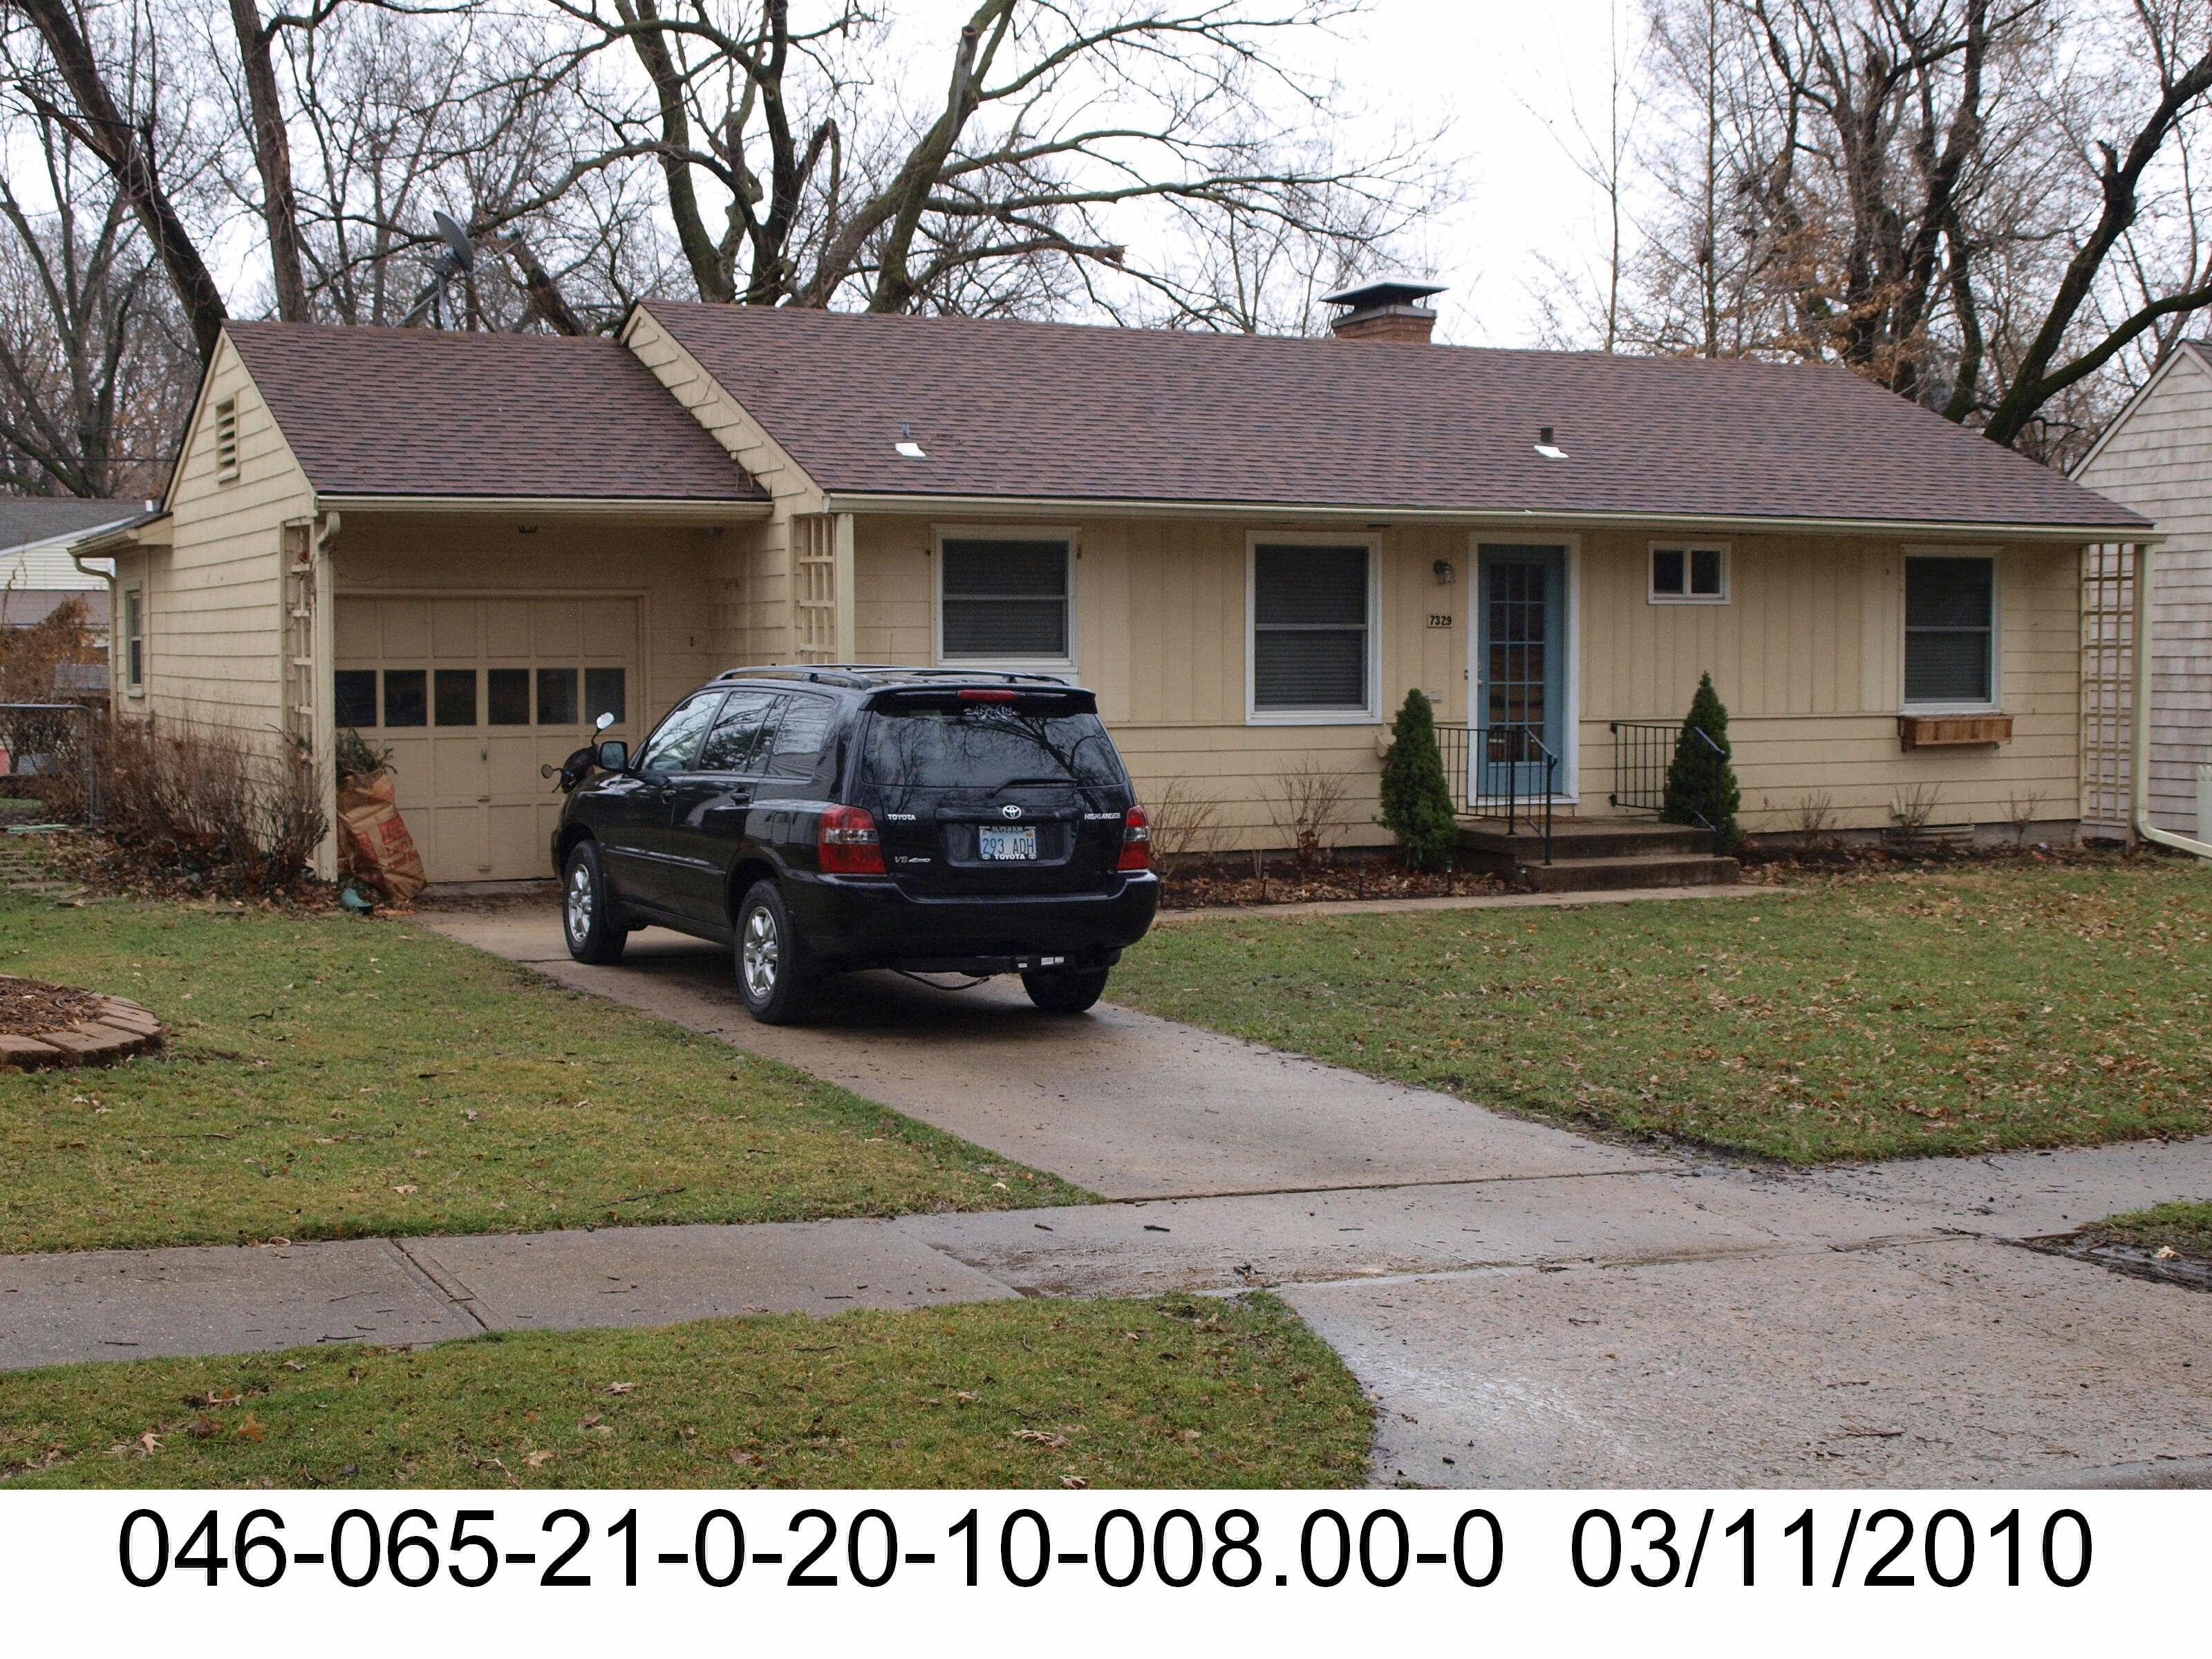 Kansas johnson county prairie village -  145 950 Property In Prairie Village Kansas